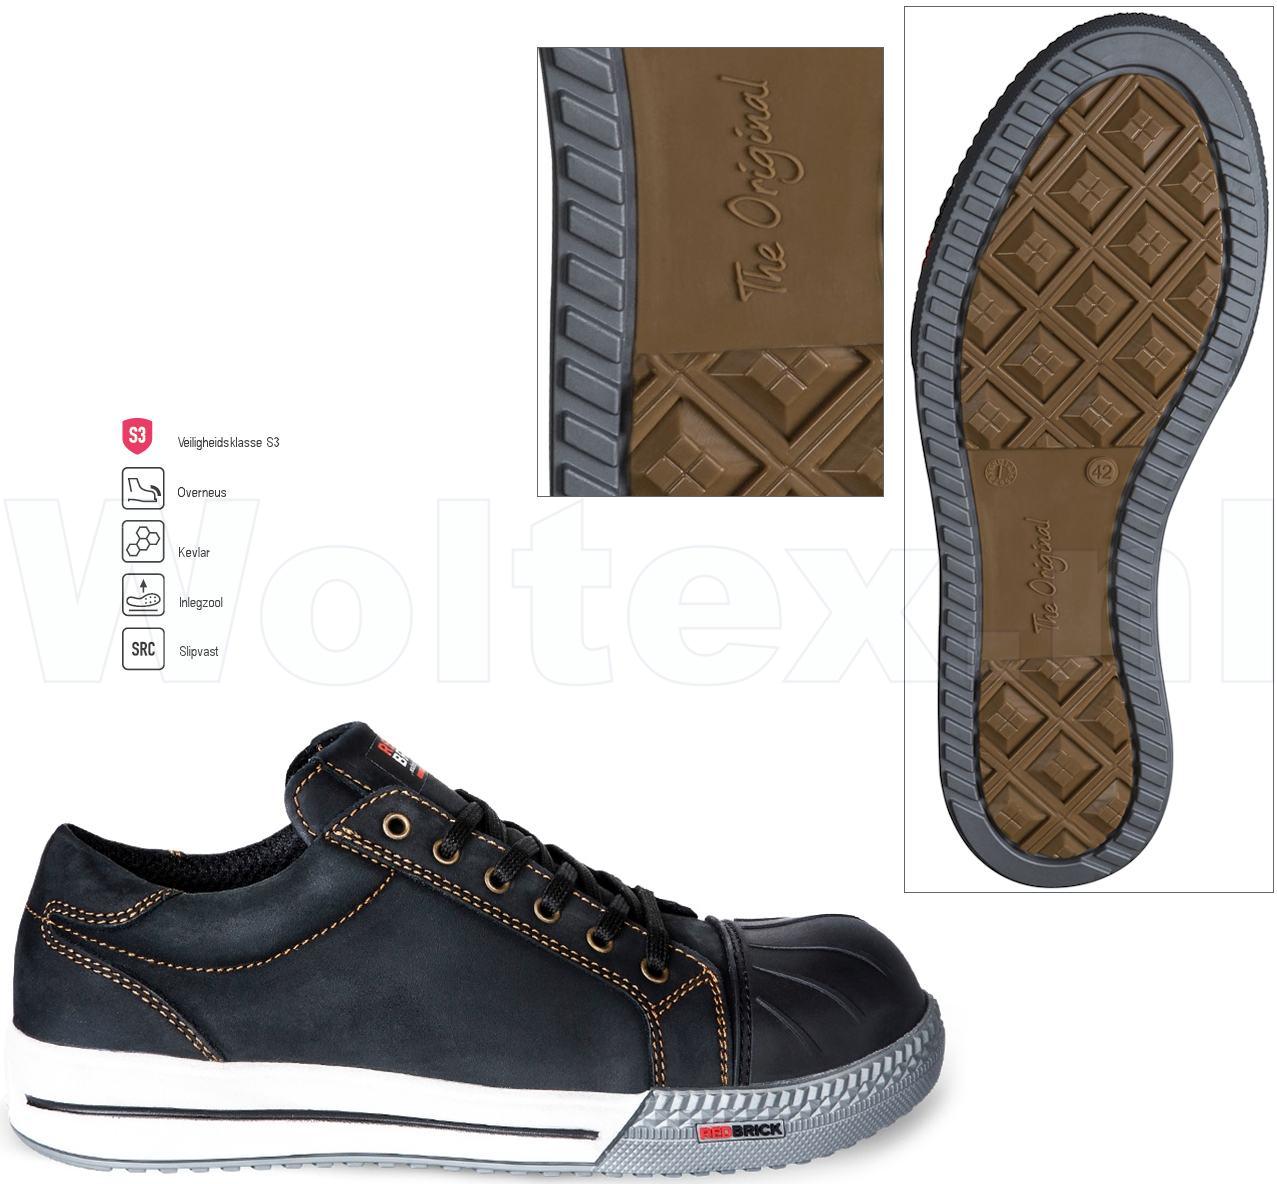 Modieuze Werkschoenen.Redbrick Safety Sneakers Originals S3 Werkschoenen Flint Overneus